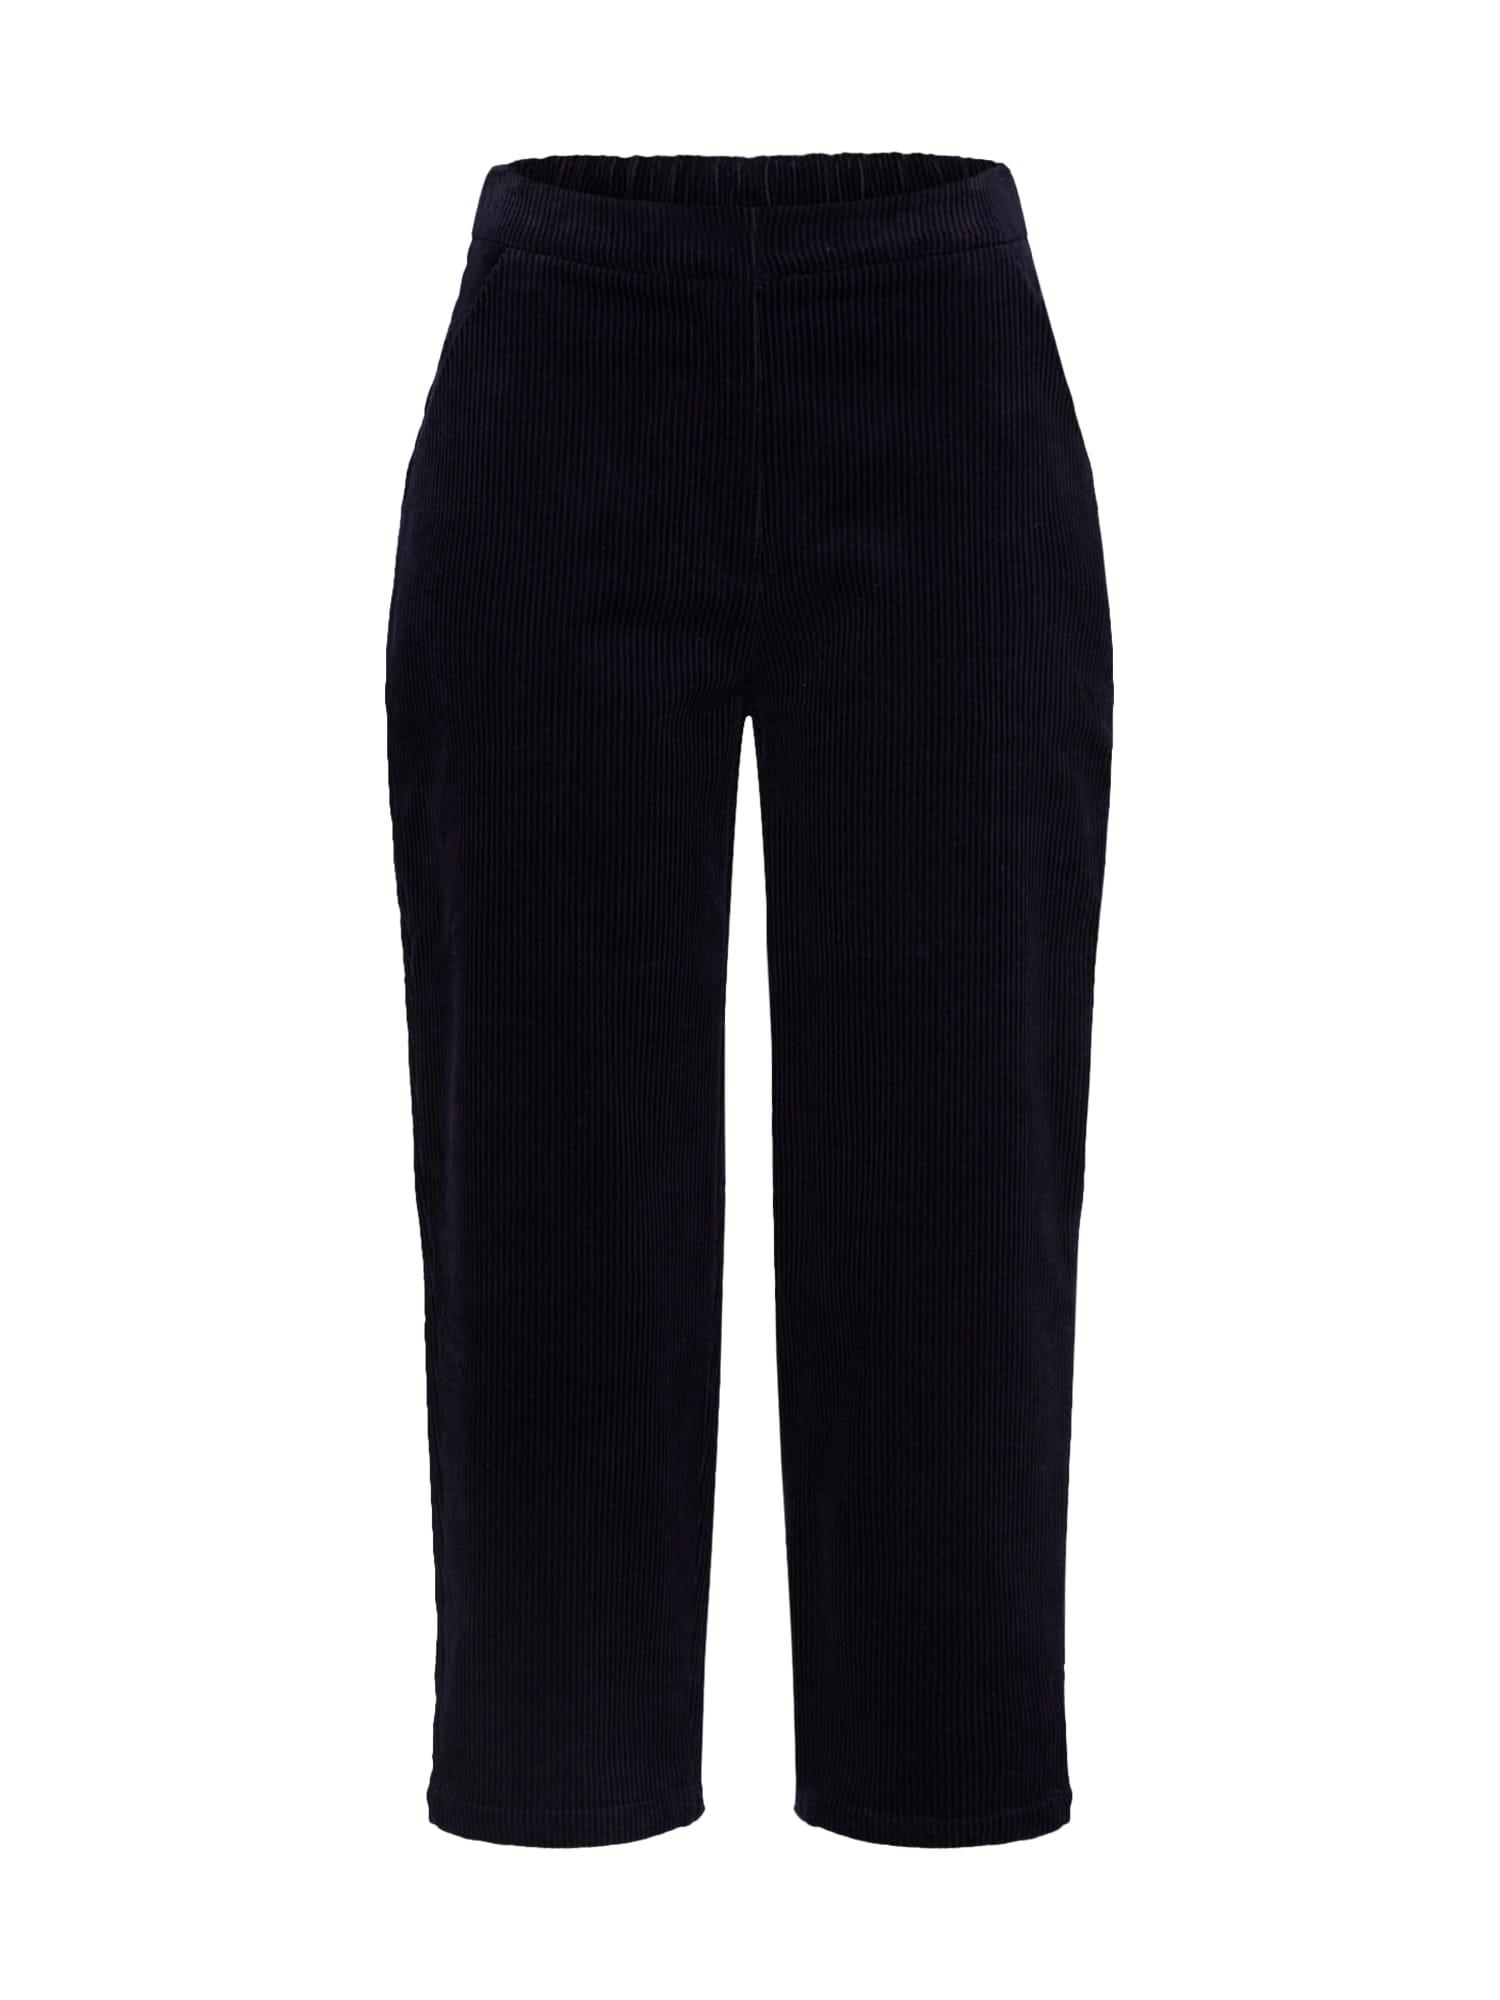 Kalhoty modrá Minimum